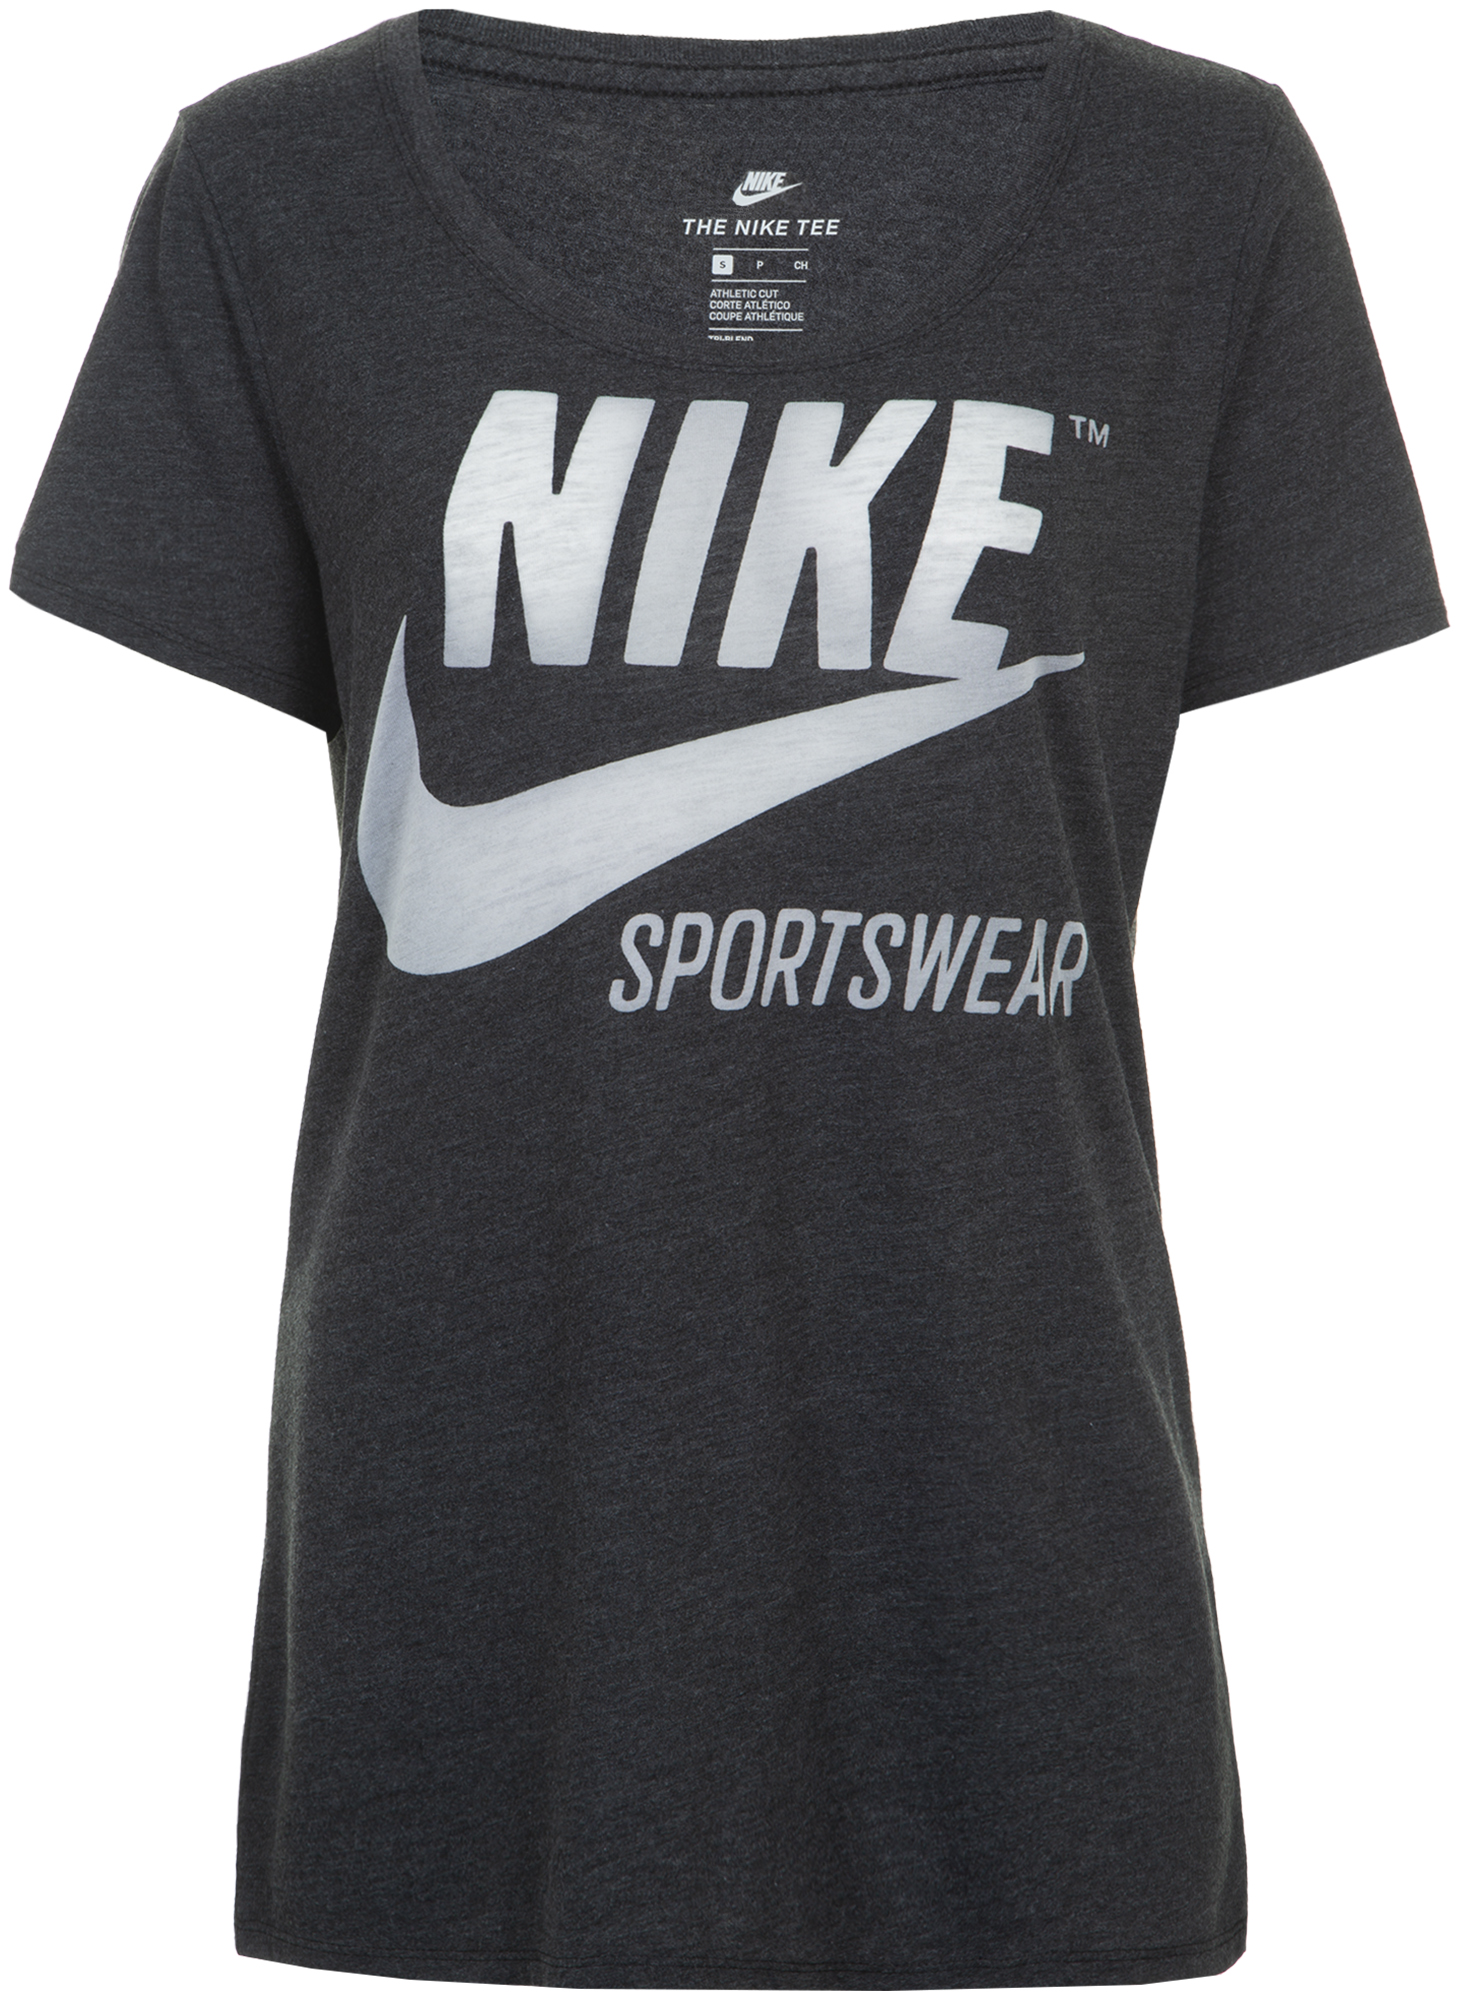 Nike Футболка женская Nike Sportswear, размер 50-52 levi's® серая футболка с логотипом sportswear logo graphic